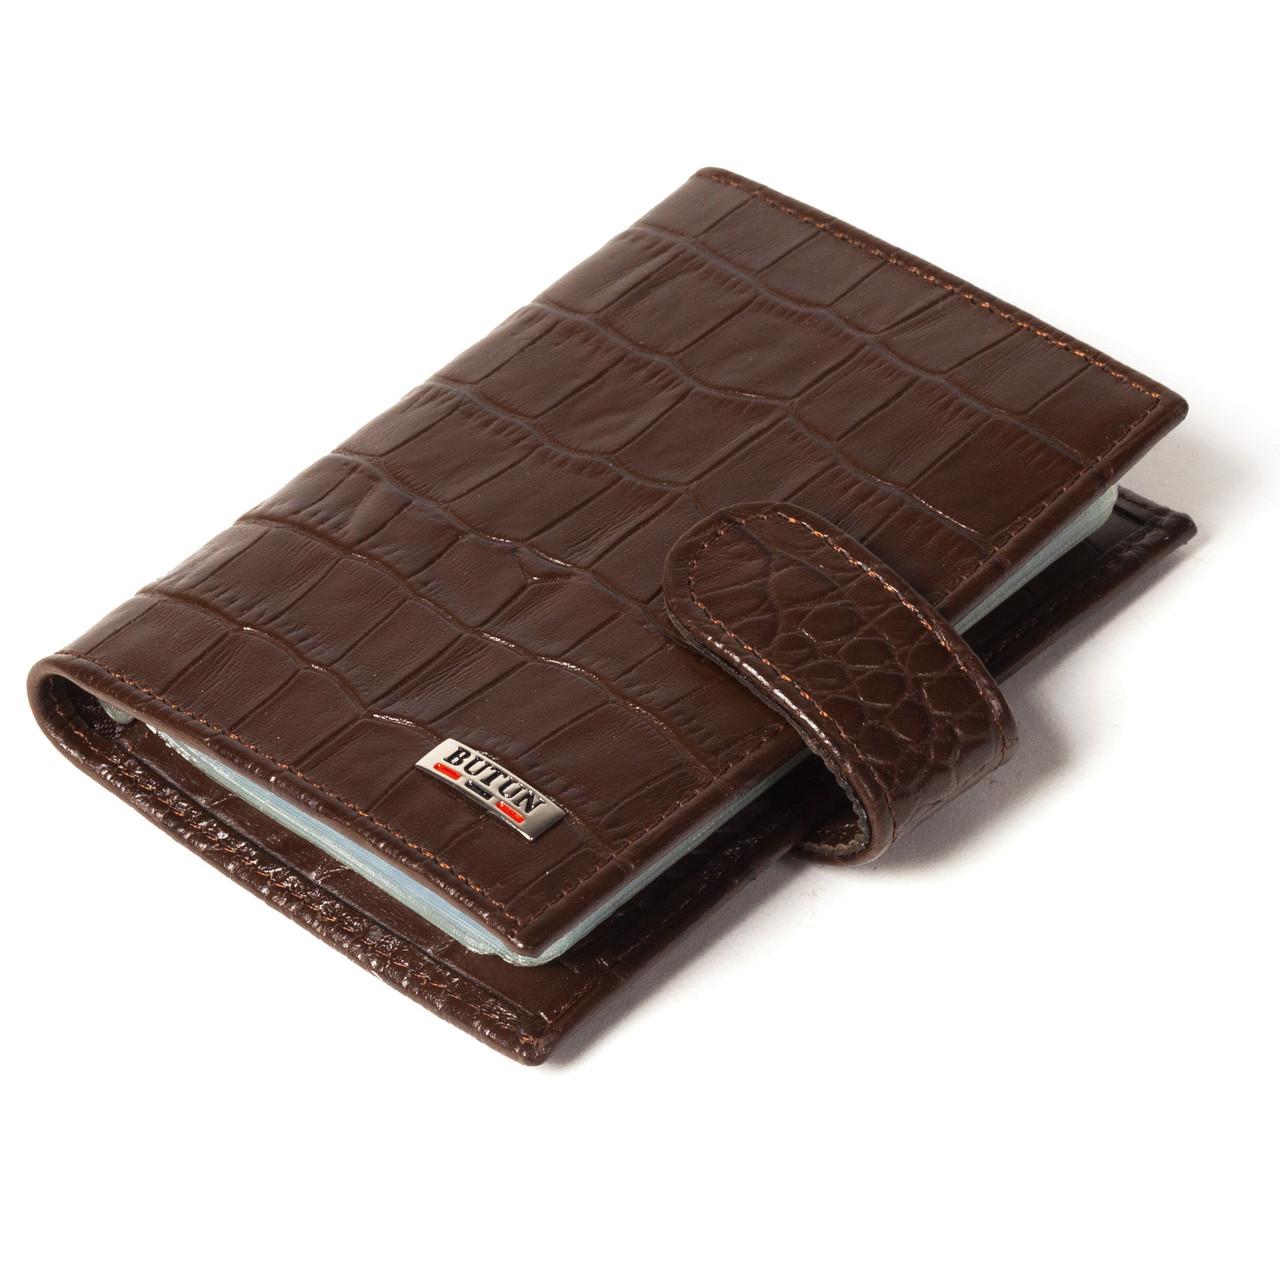 Визитница кредитница кожаная коричневая Butun 152-002-004